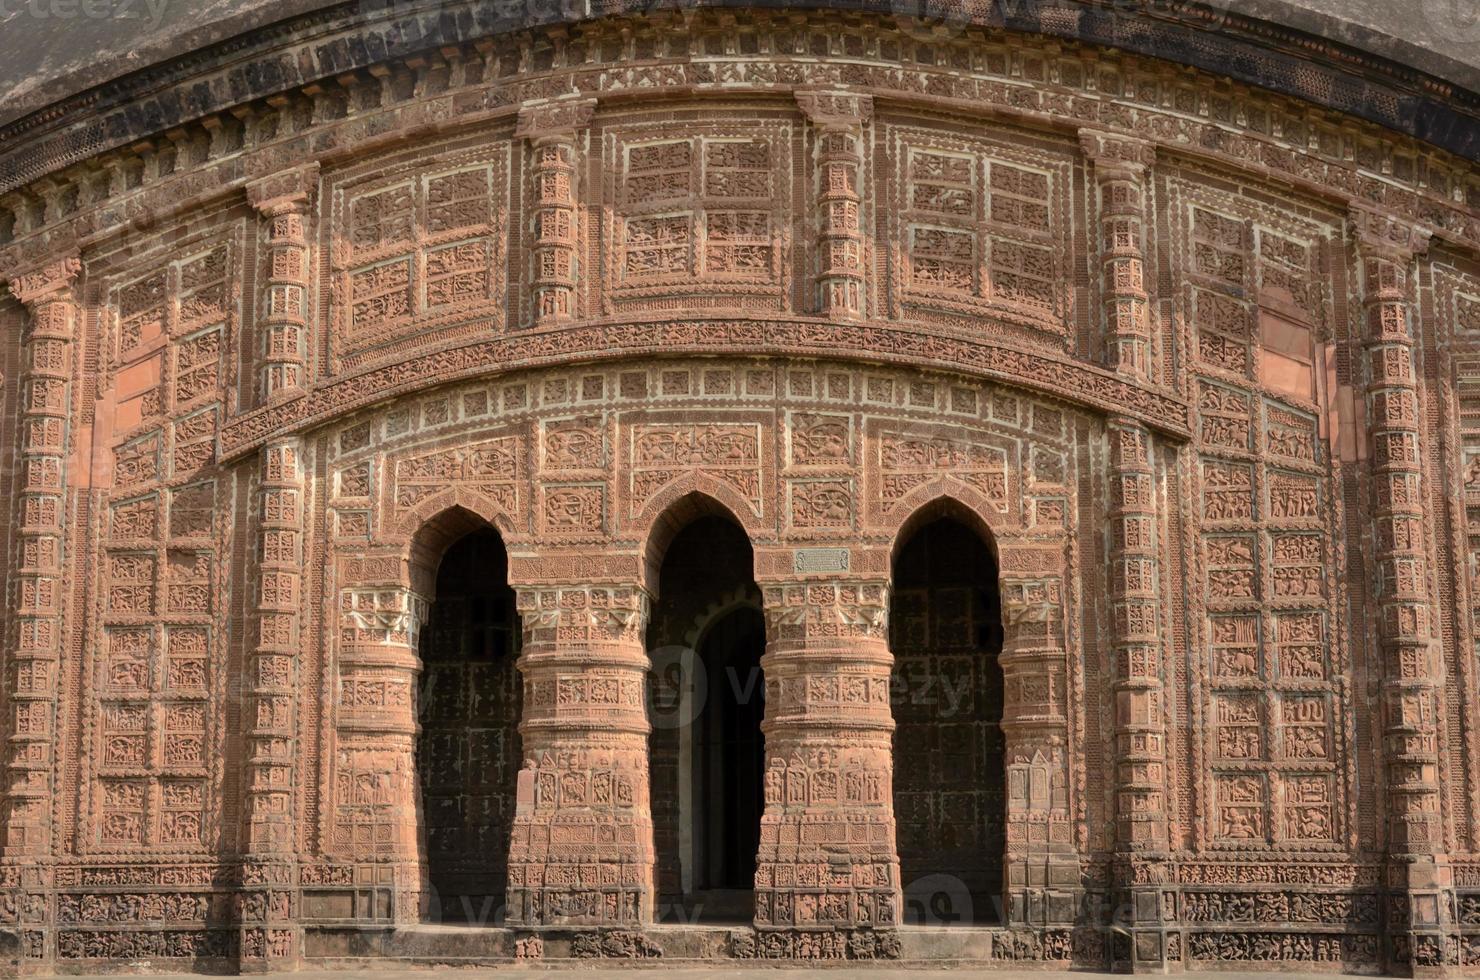 Arches of  temple - Bishnupur, India photo